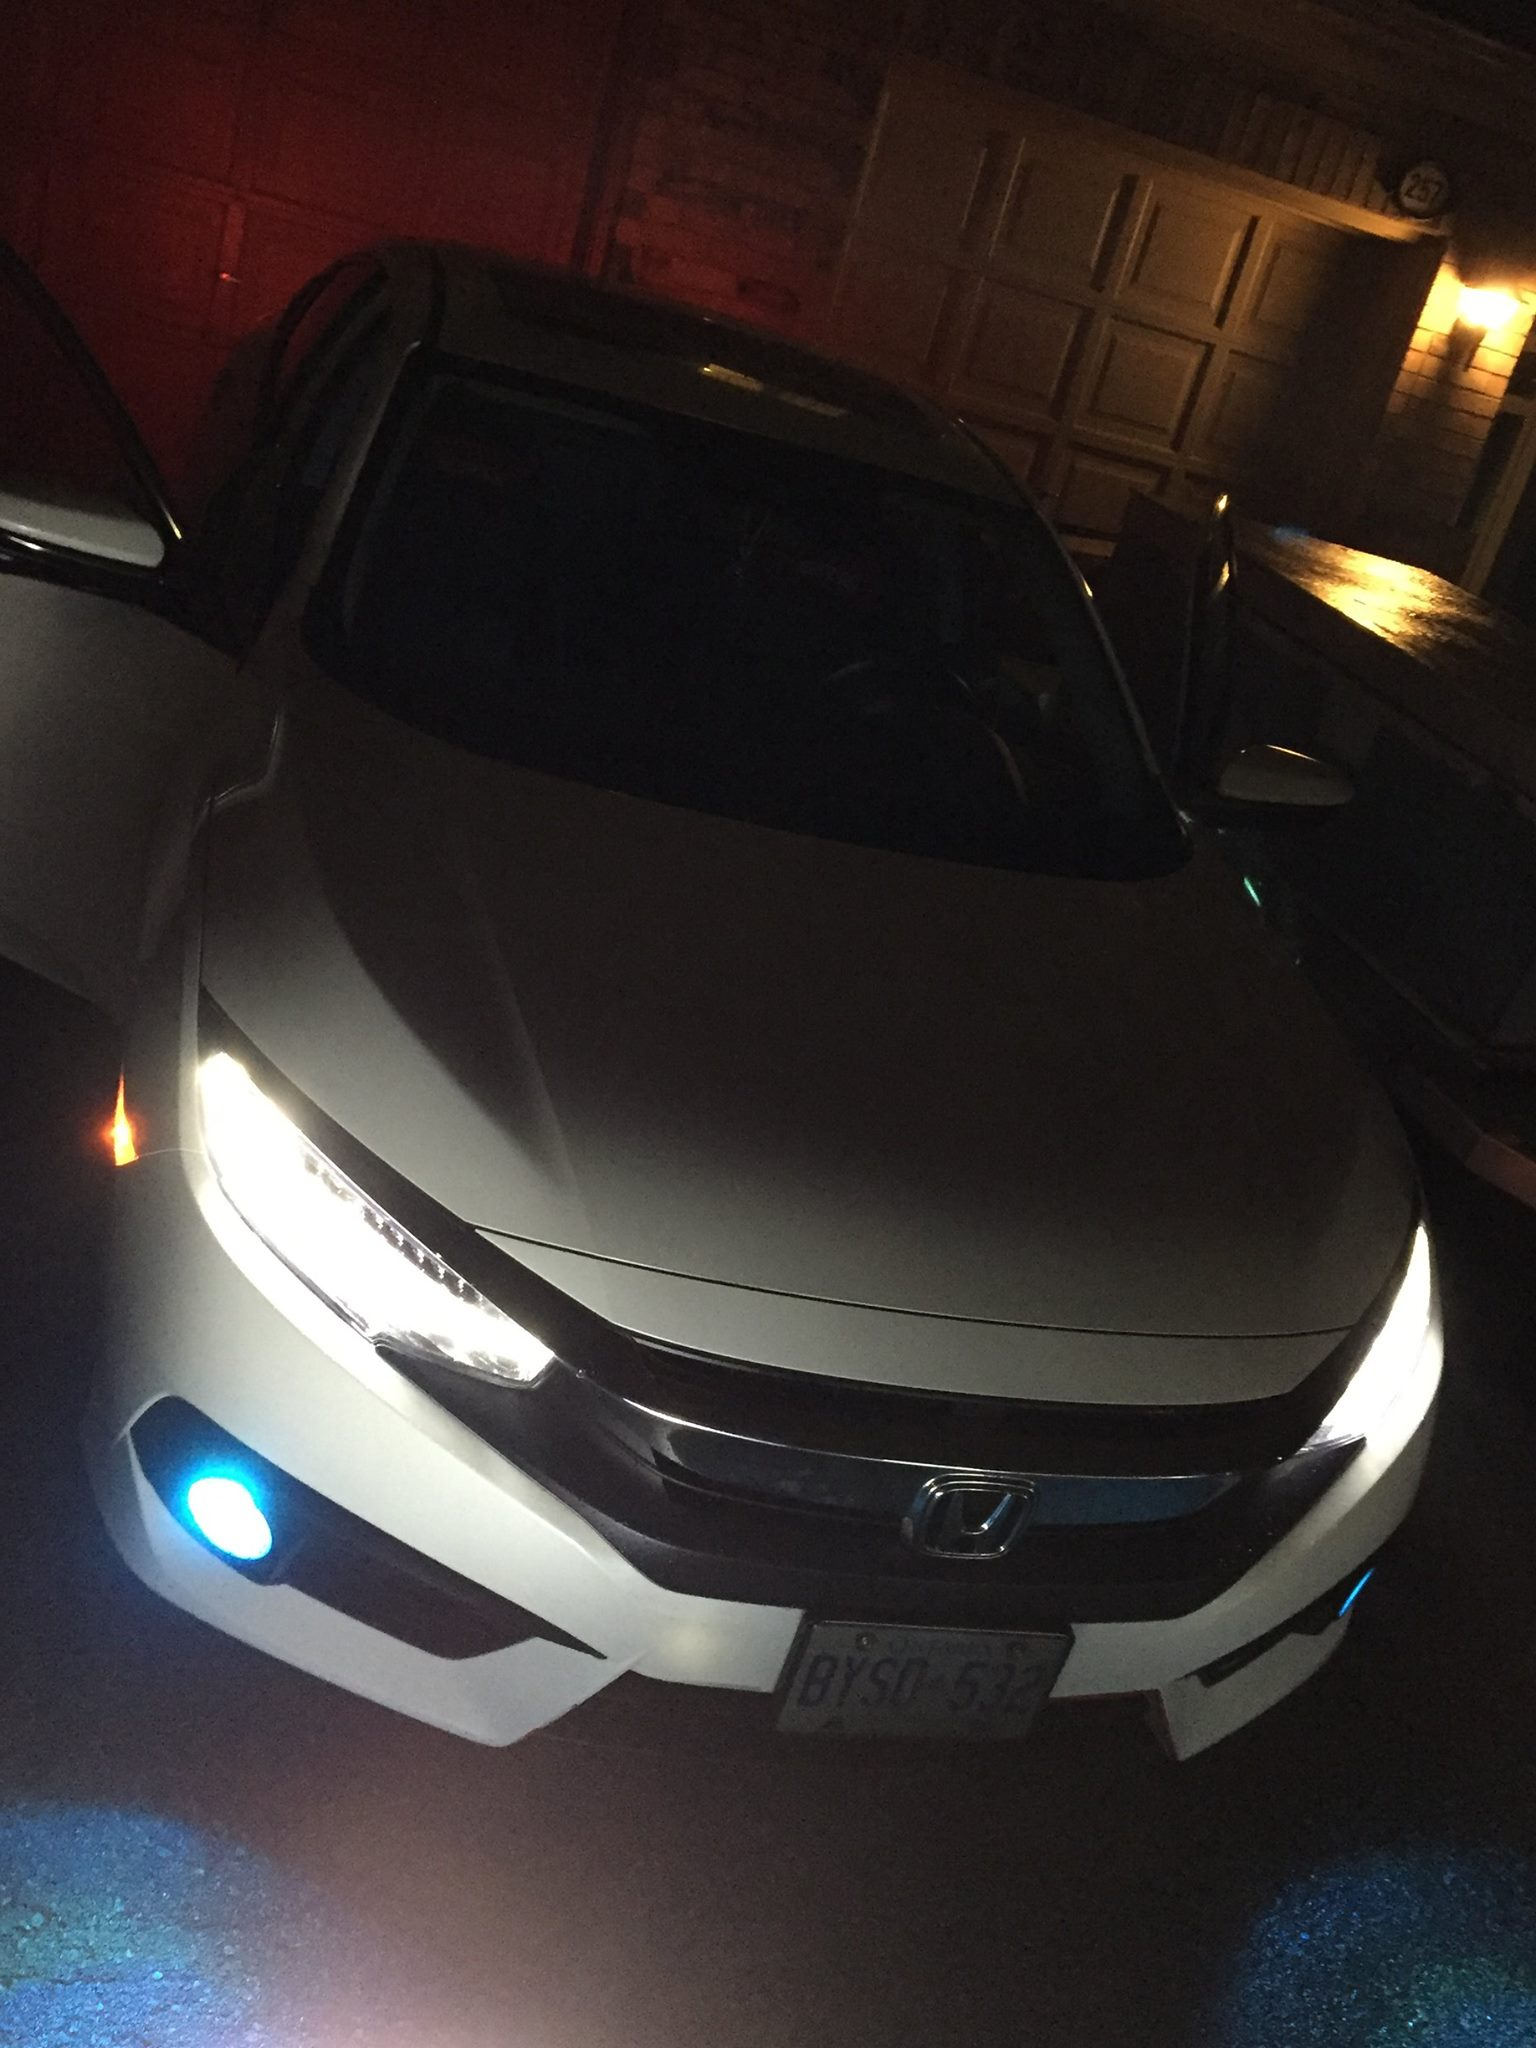 Light Blue Honda : light, honda, Light, Foglights, 2016+, Honda, Civic, Forum, (10th, Forum,, CivicX.com